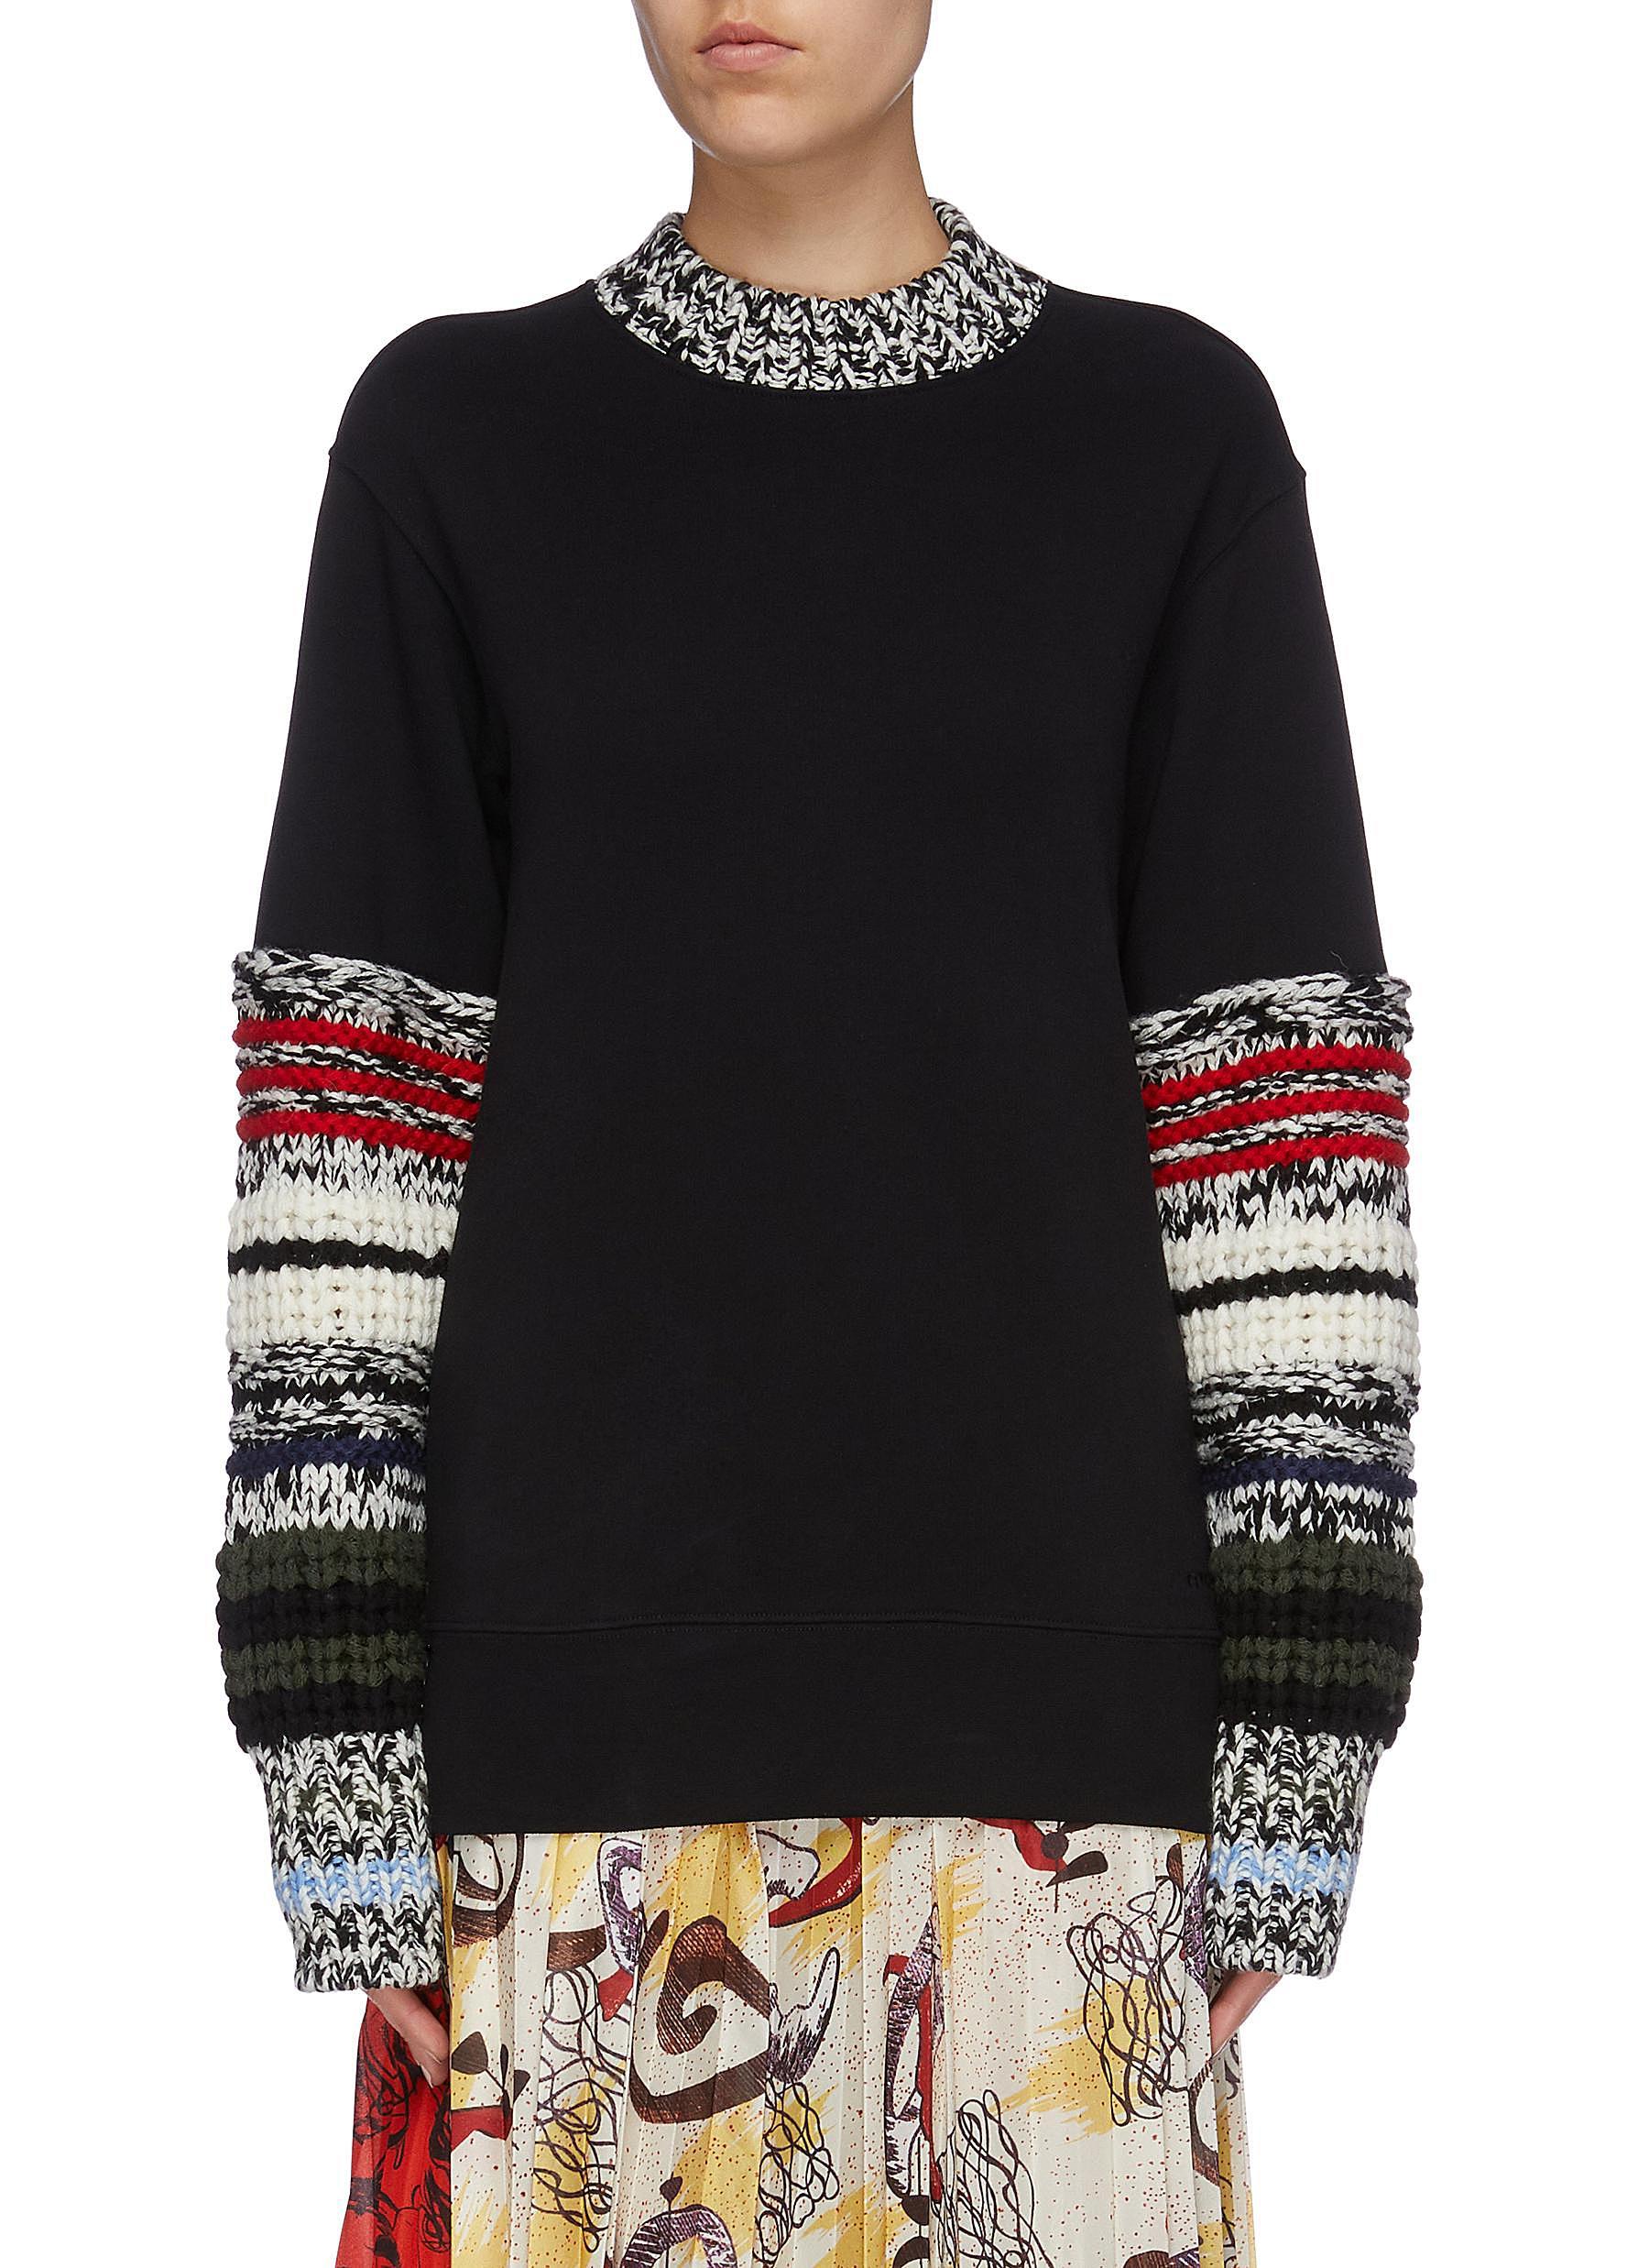 Patchwork wool knit sleeve sweatshirt by Sonia Rykiel